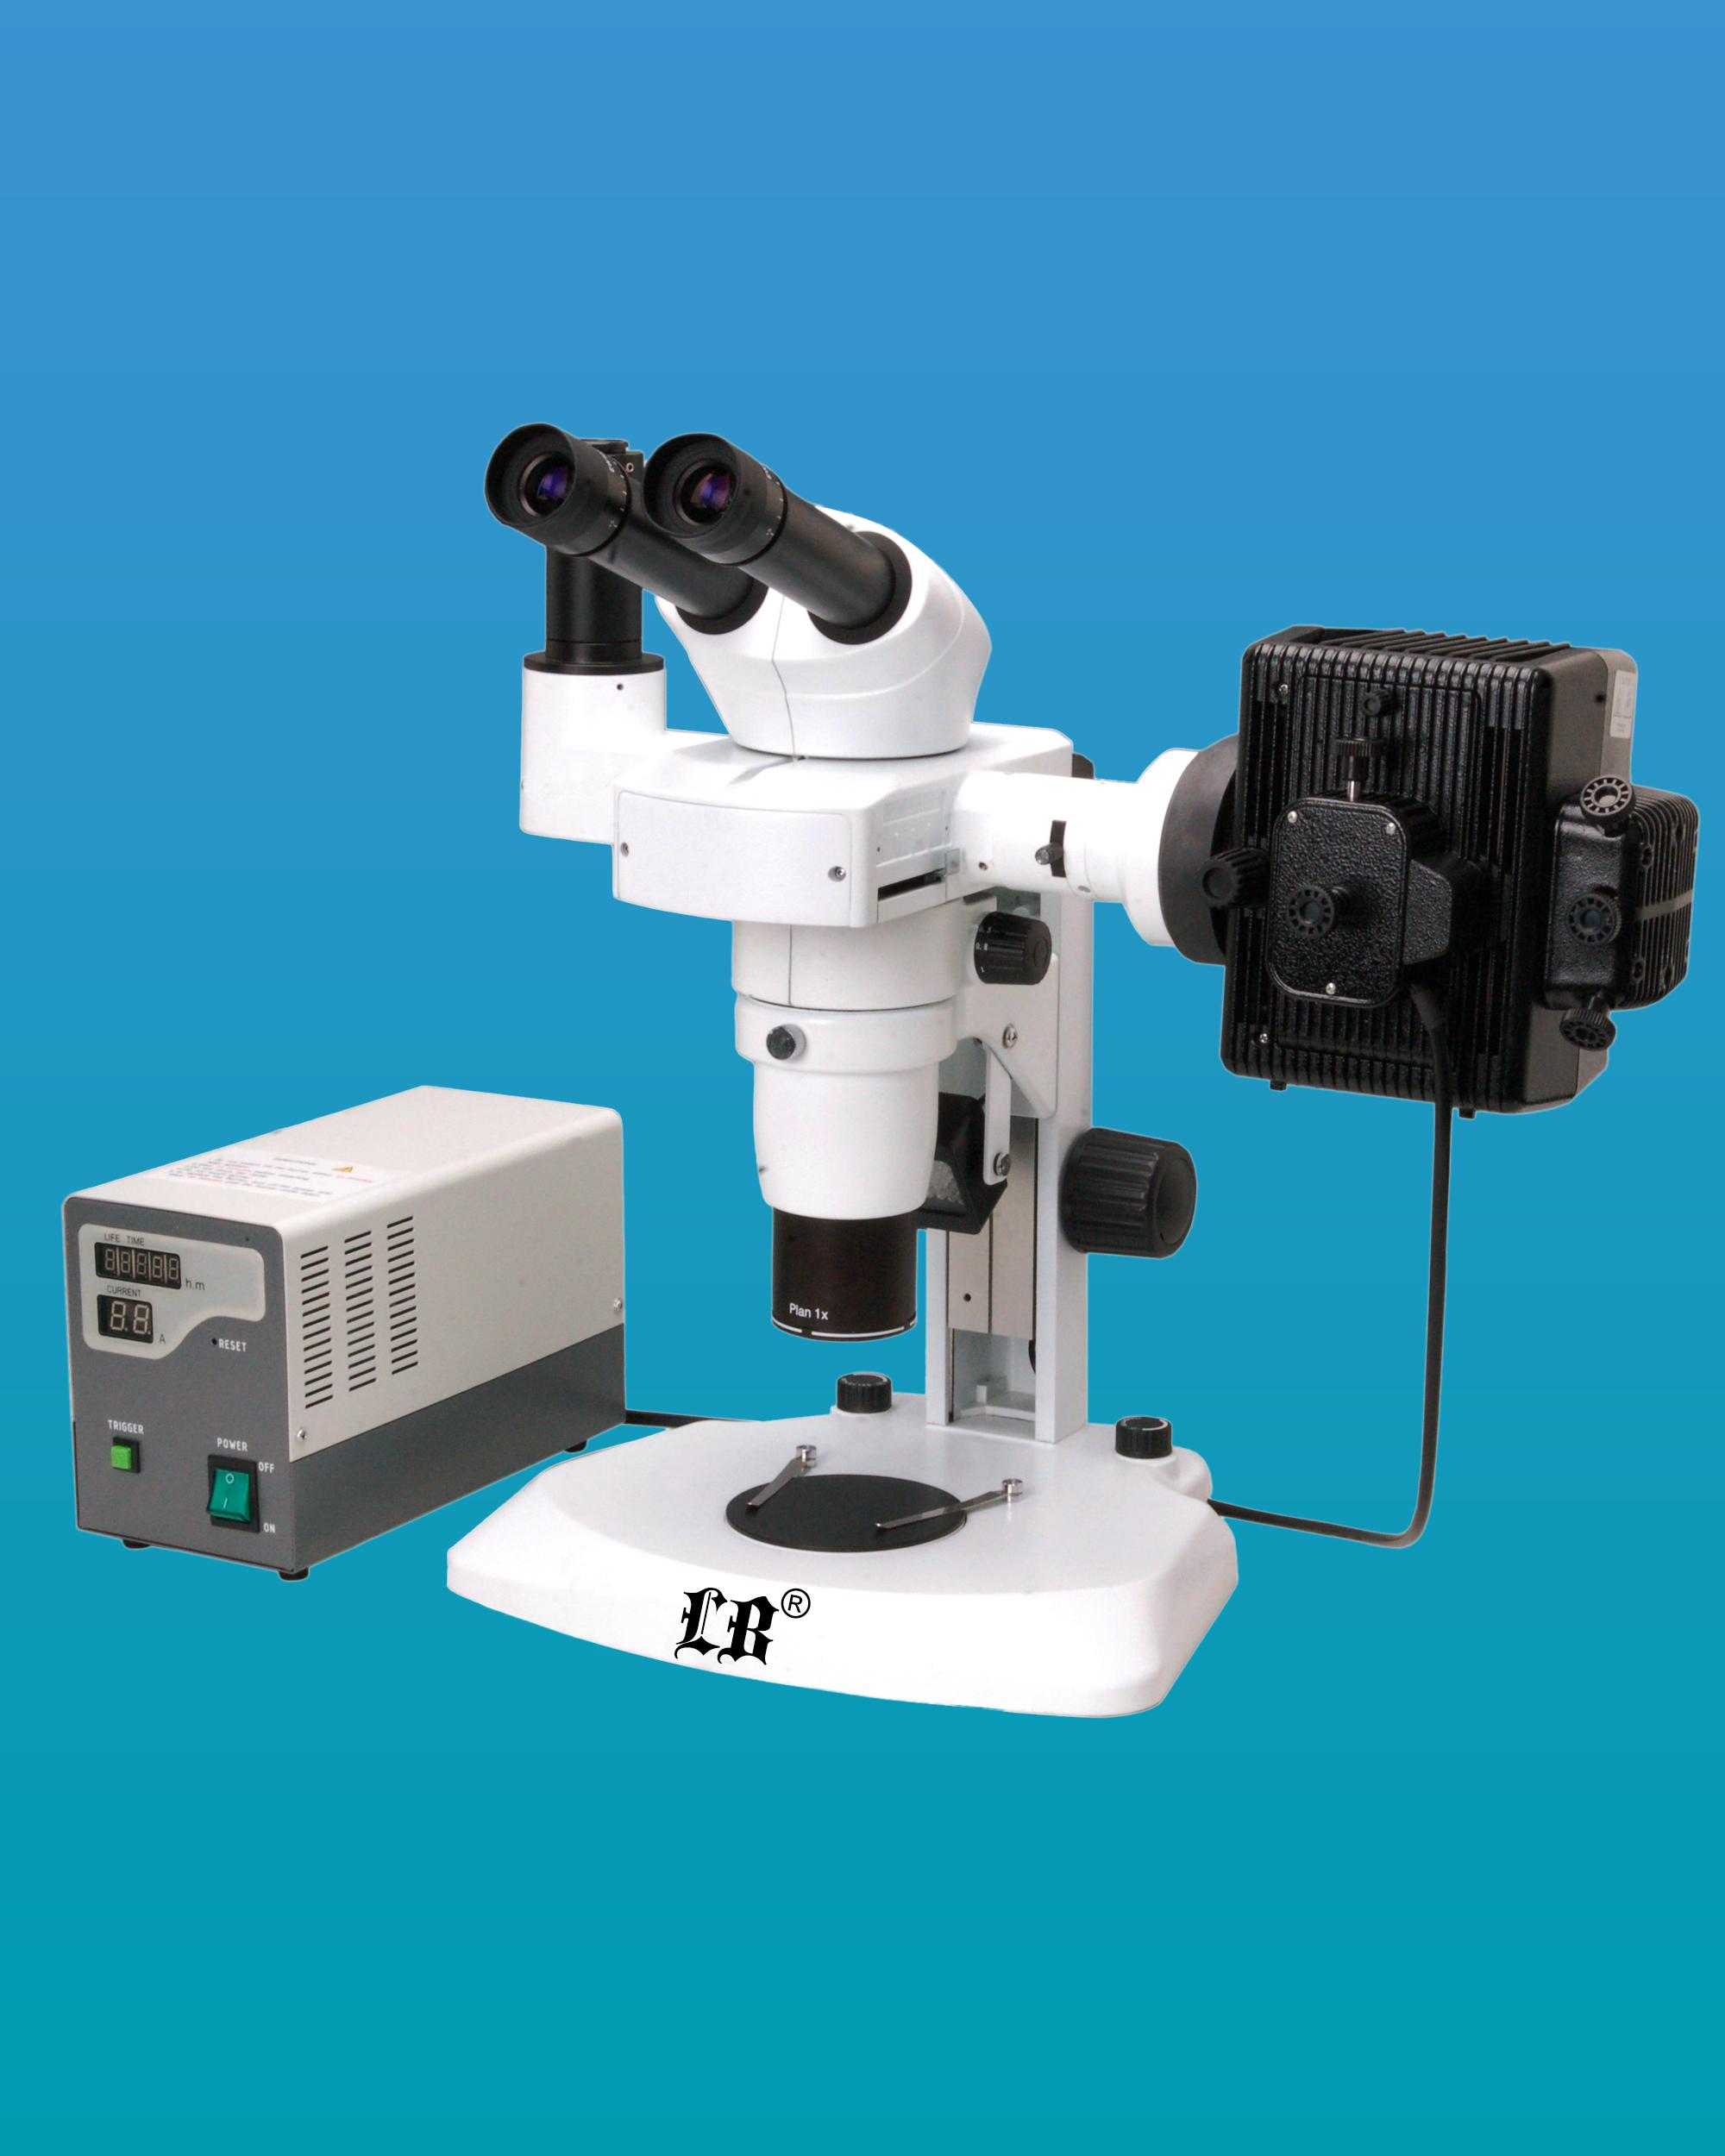 [LB-369] Binocular Zoom Fluorescent Stereo Microscope w/ Infinite Parallel Zoom Optical System & LED Illumination